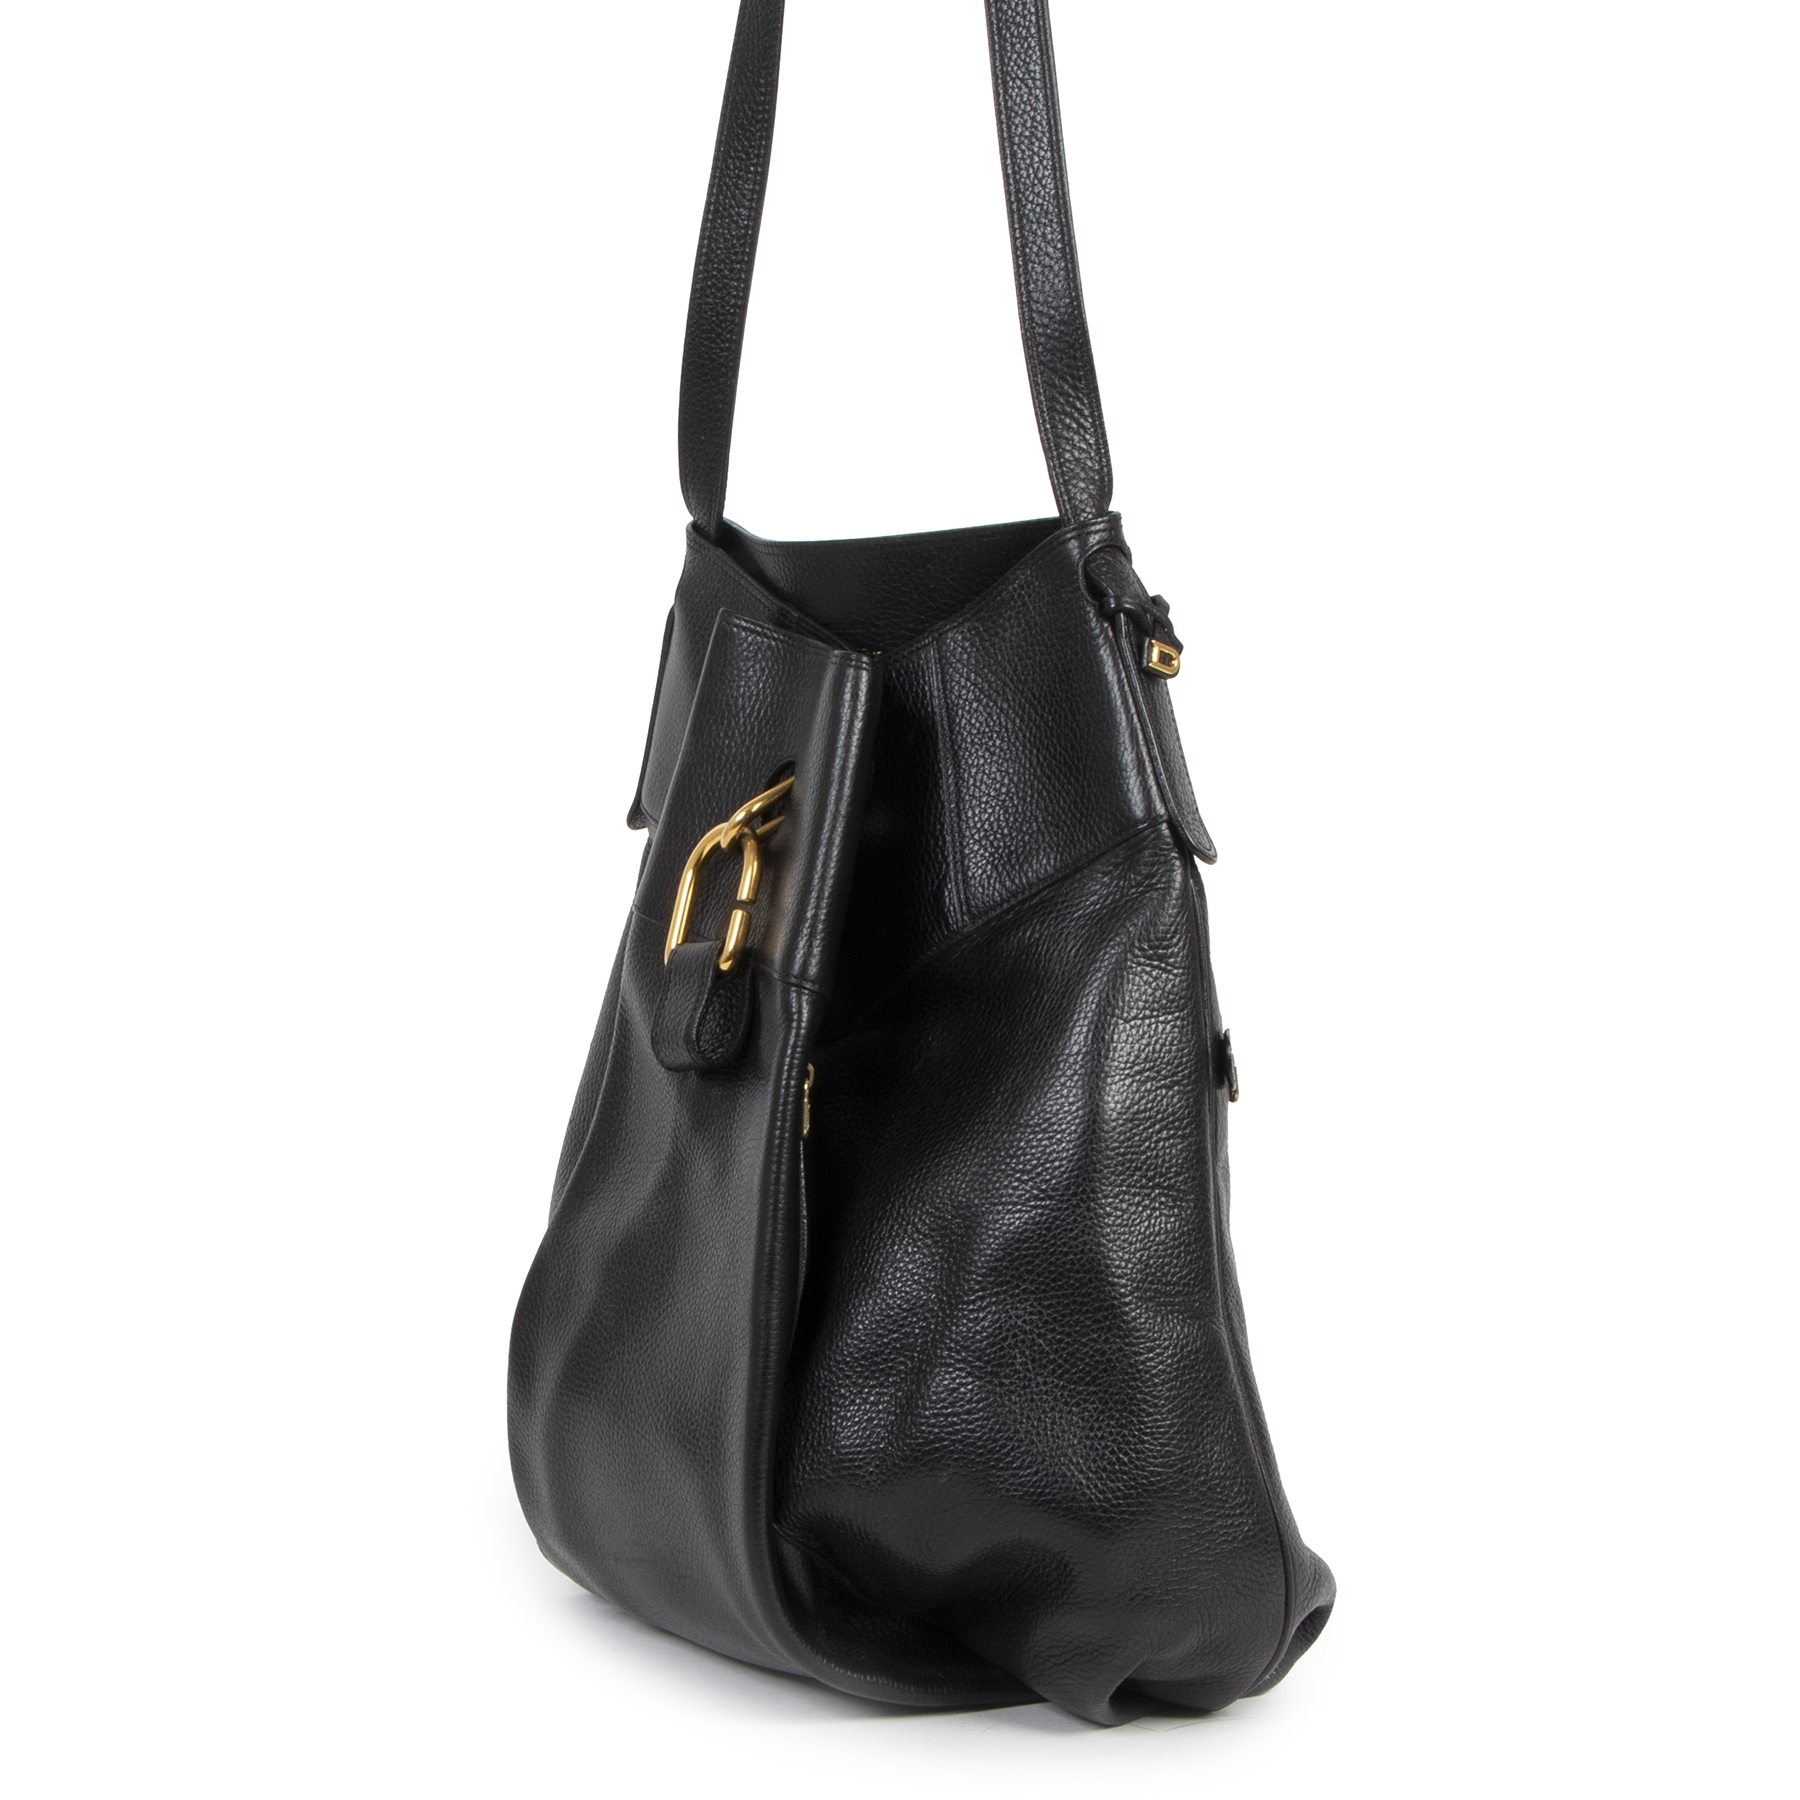 Authentic second-hand vintage Delvaux Black Faust Shoulder Bag buy online webshop LabelLOV